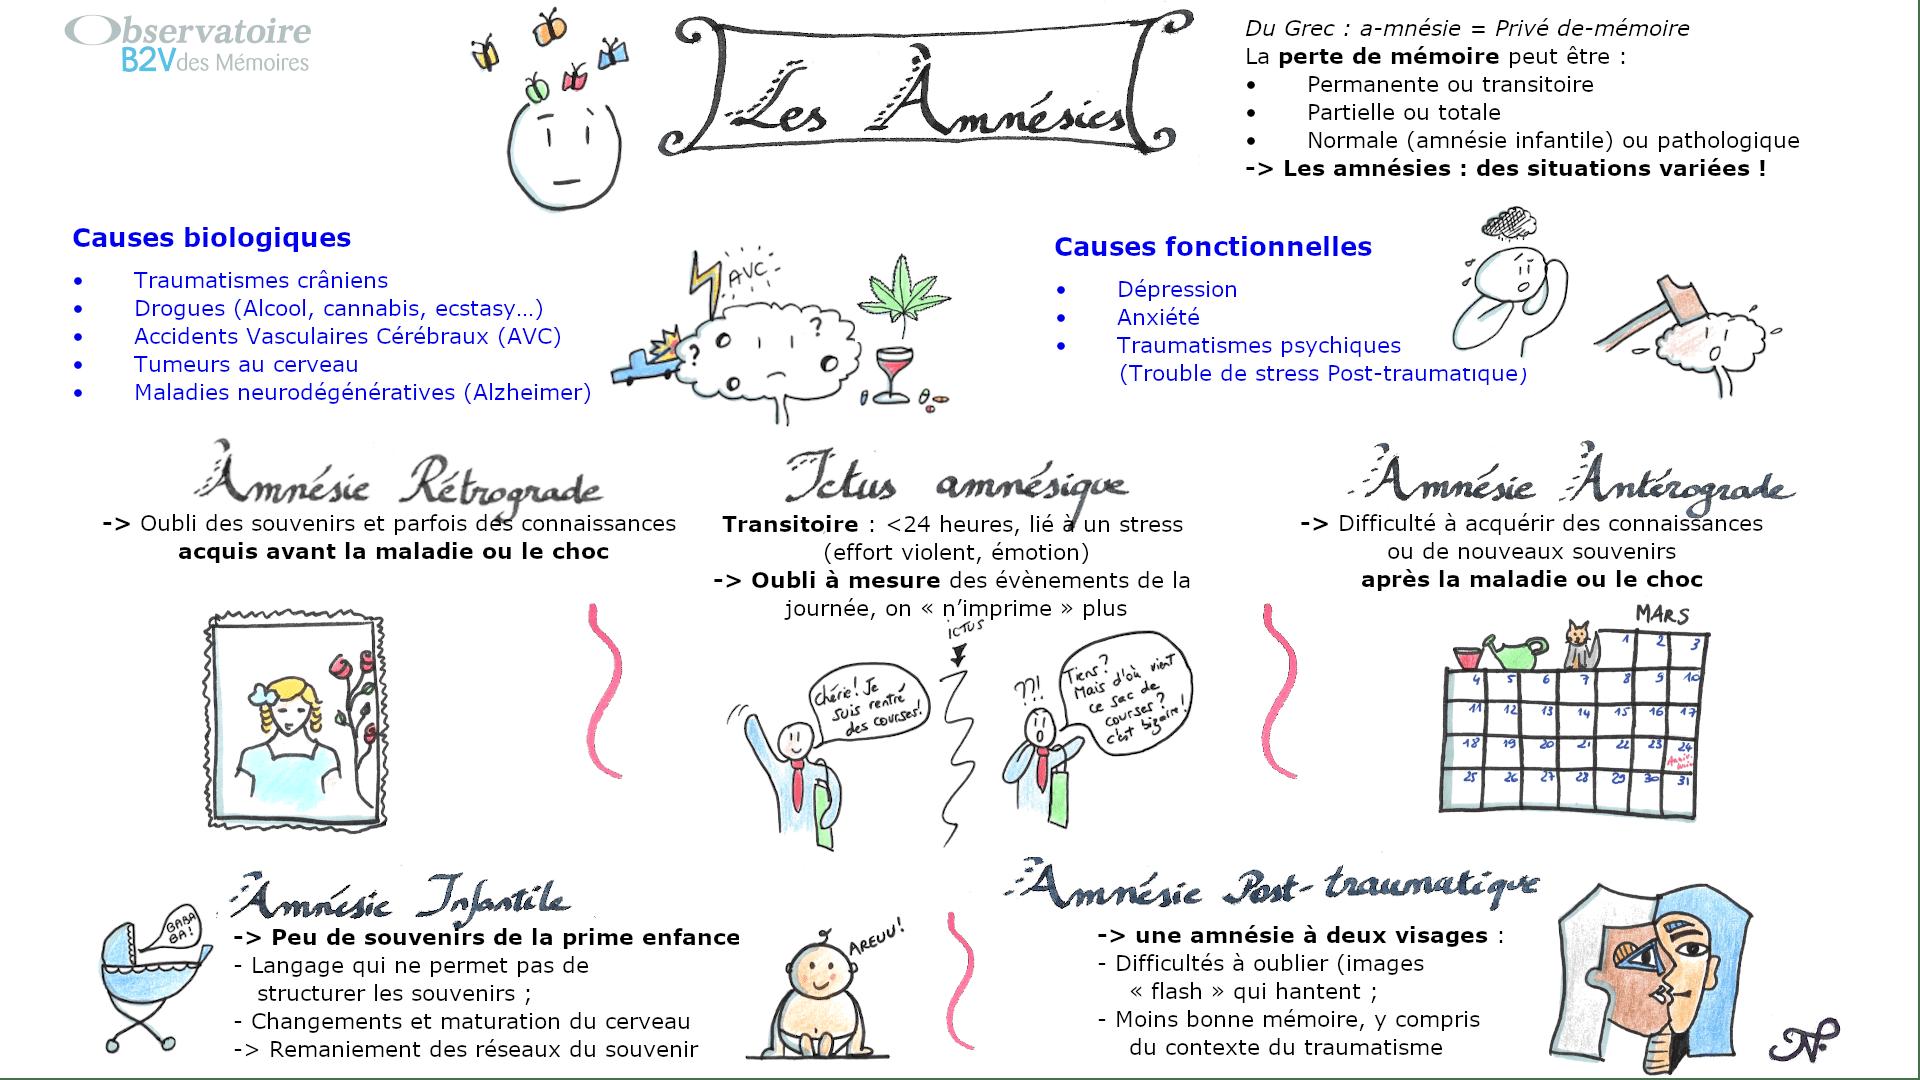 Sketchnote Amnésie